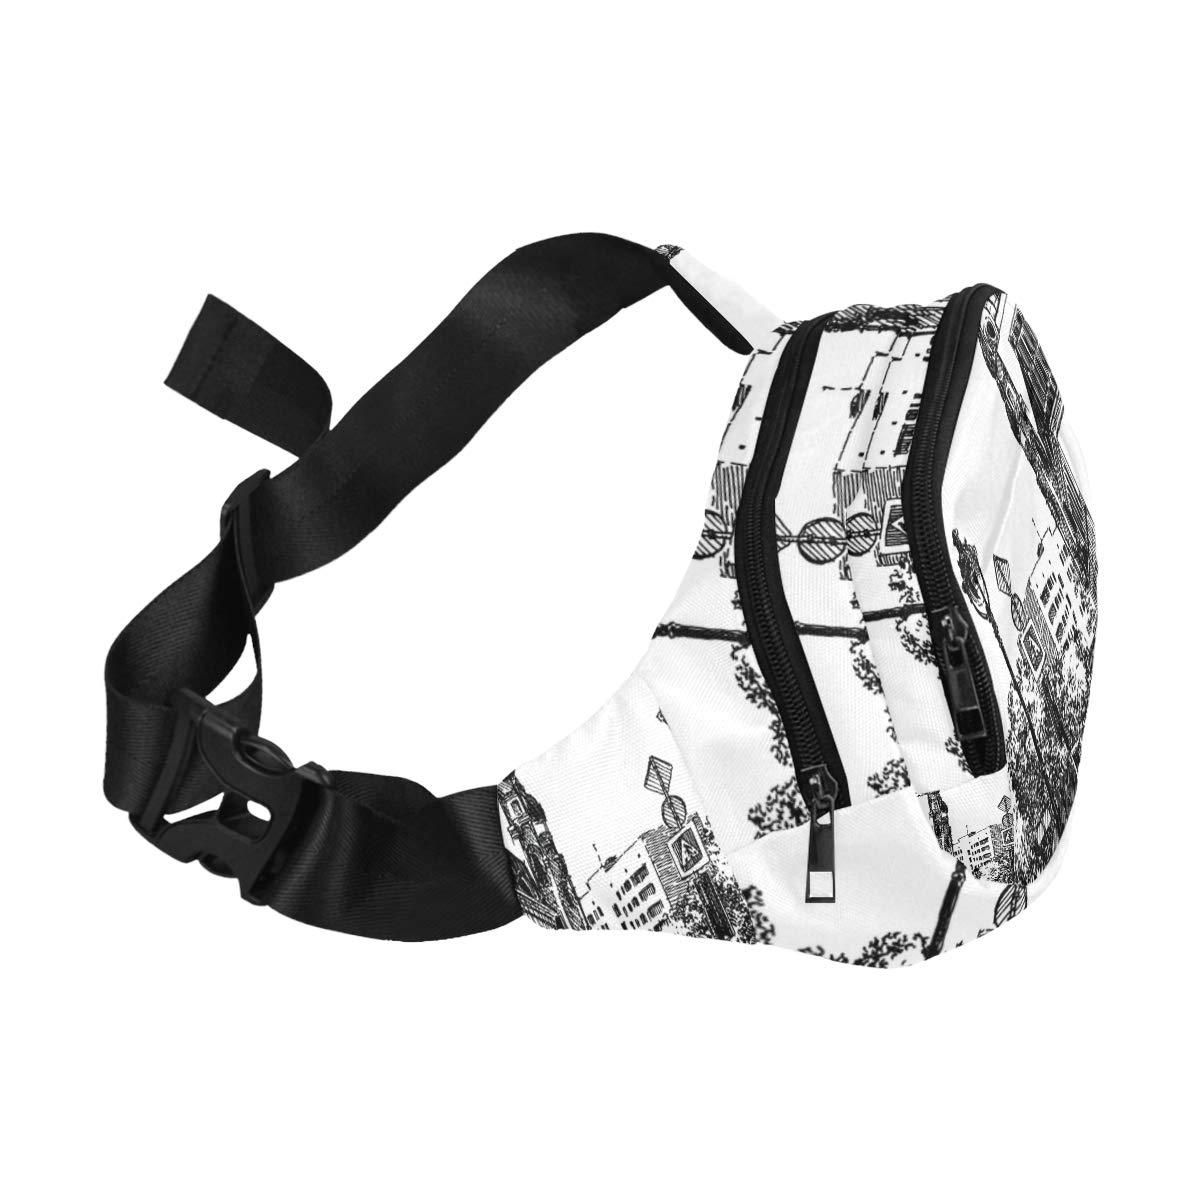 City Street Scene With Buildings Fenny Packs Waist Bags Adjustable Belt Waterproof Nylon Travel Running Sport Vacation Party For Men Women Boys Girls Kids